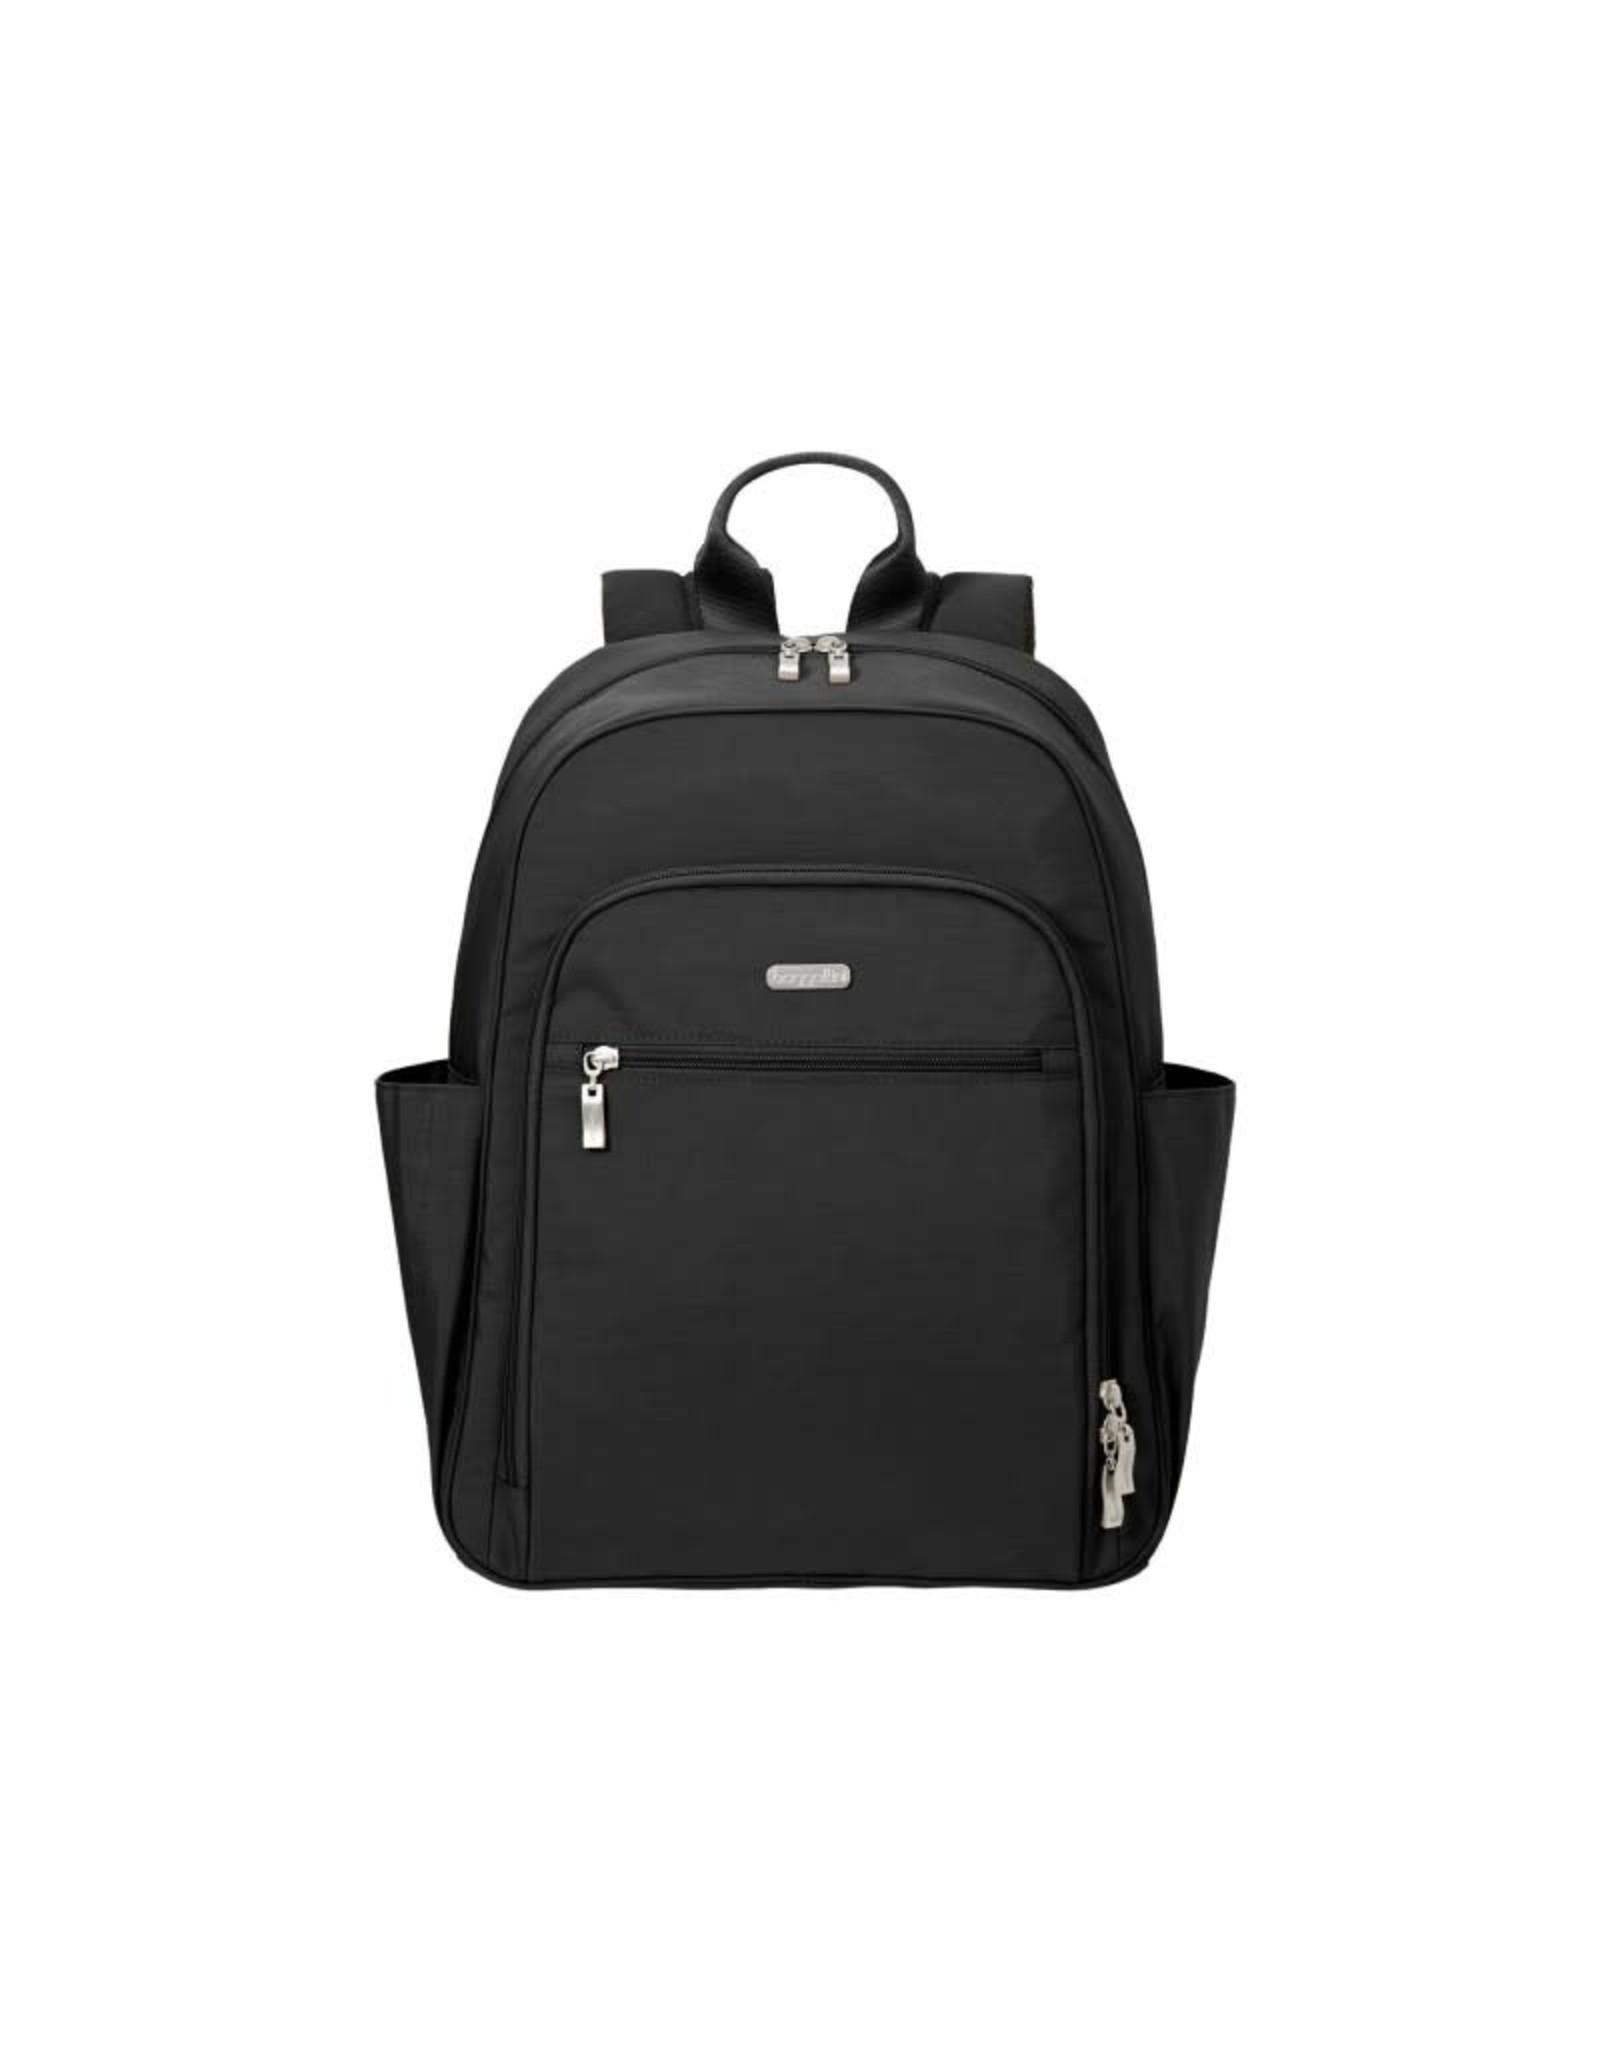 Baggallini Essential Laptop Backpack